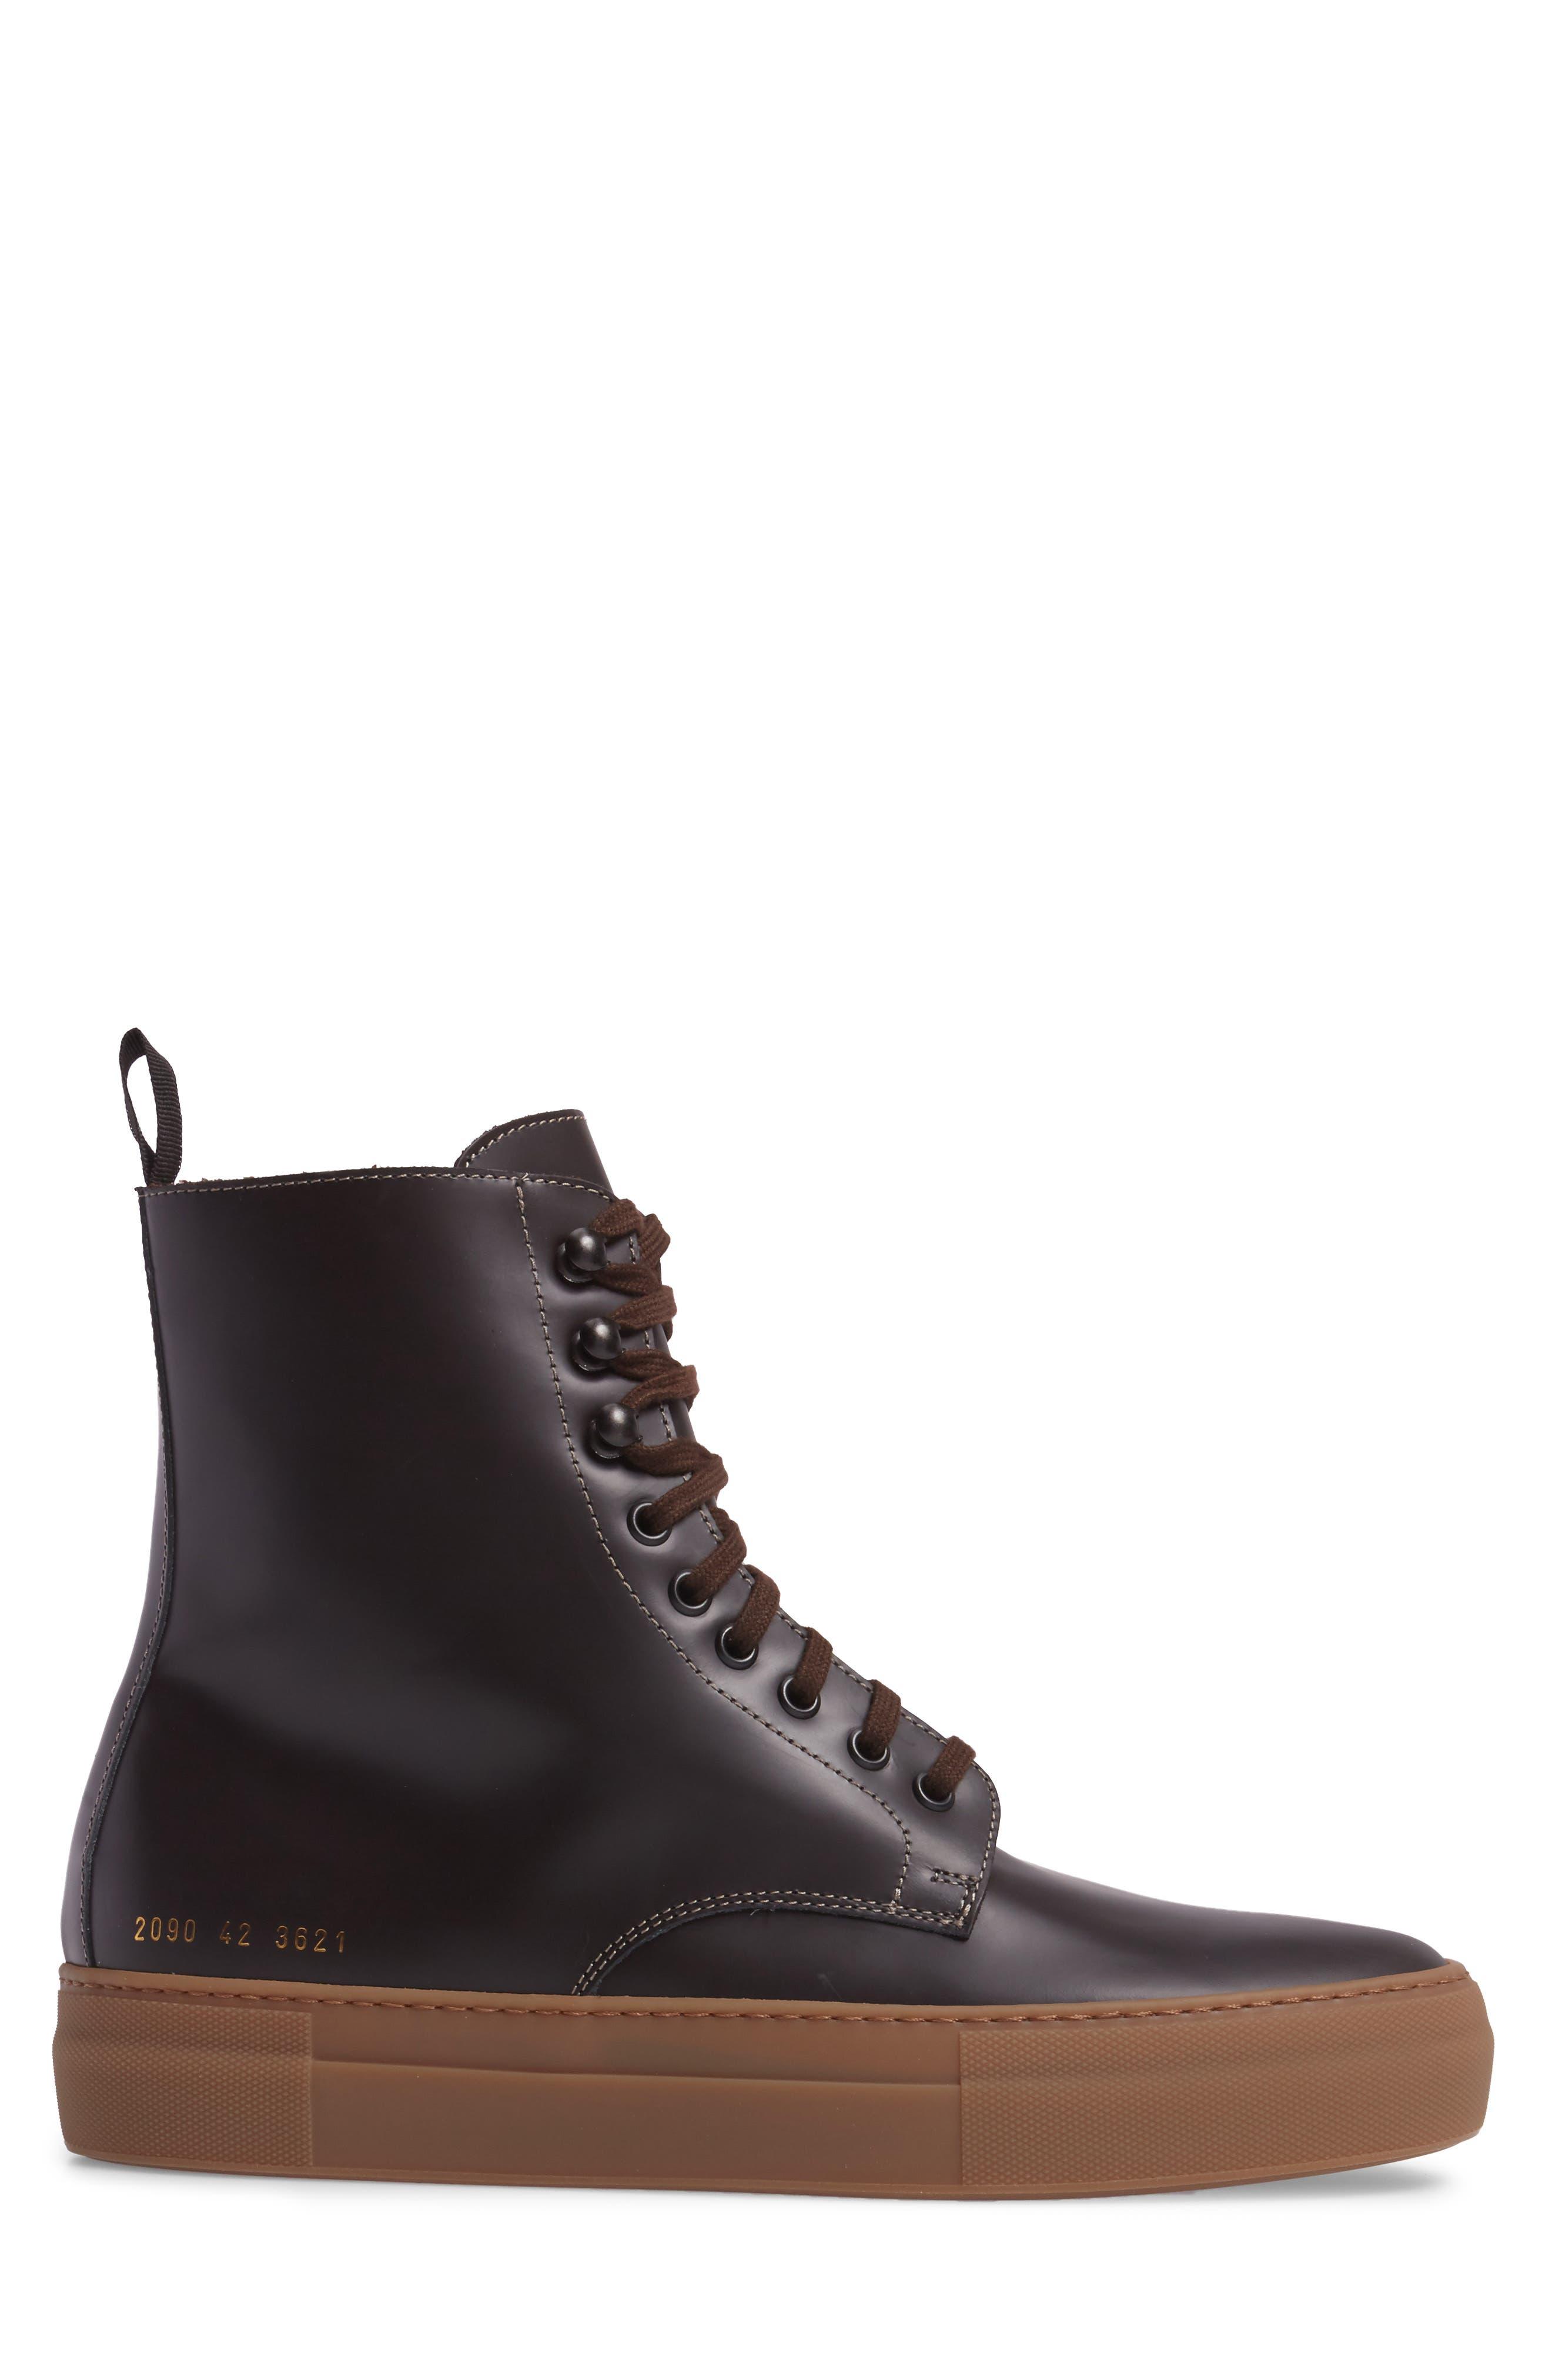 Alternate Image 3  - Common Projects x Robert Geller Plain Toe Boot (Men)